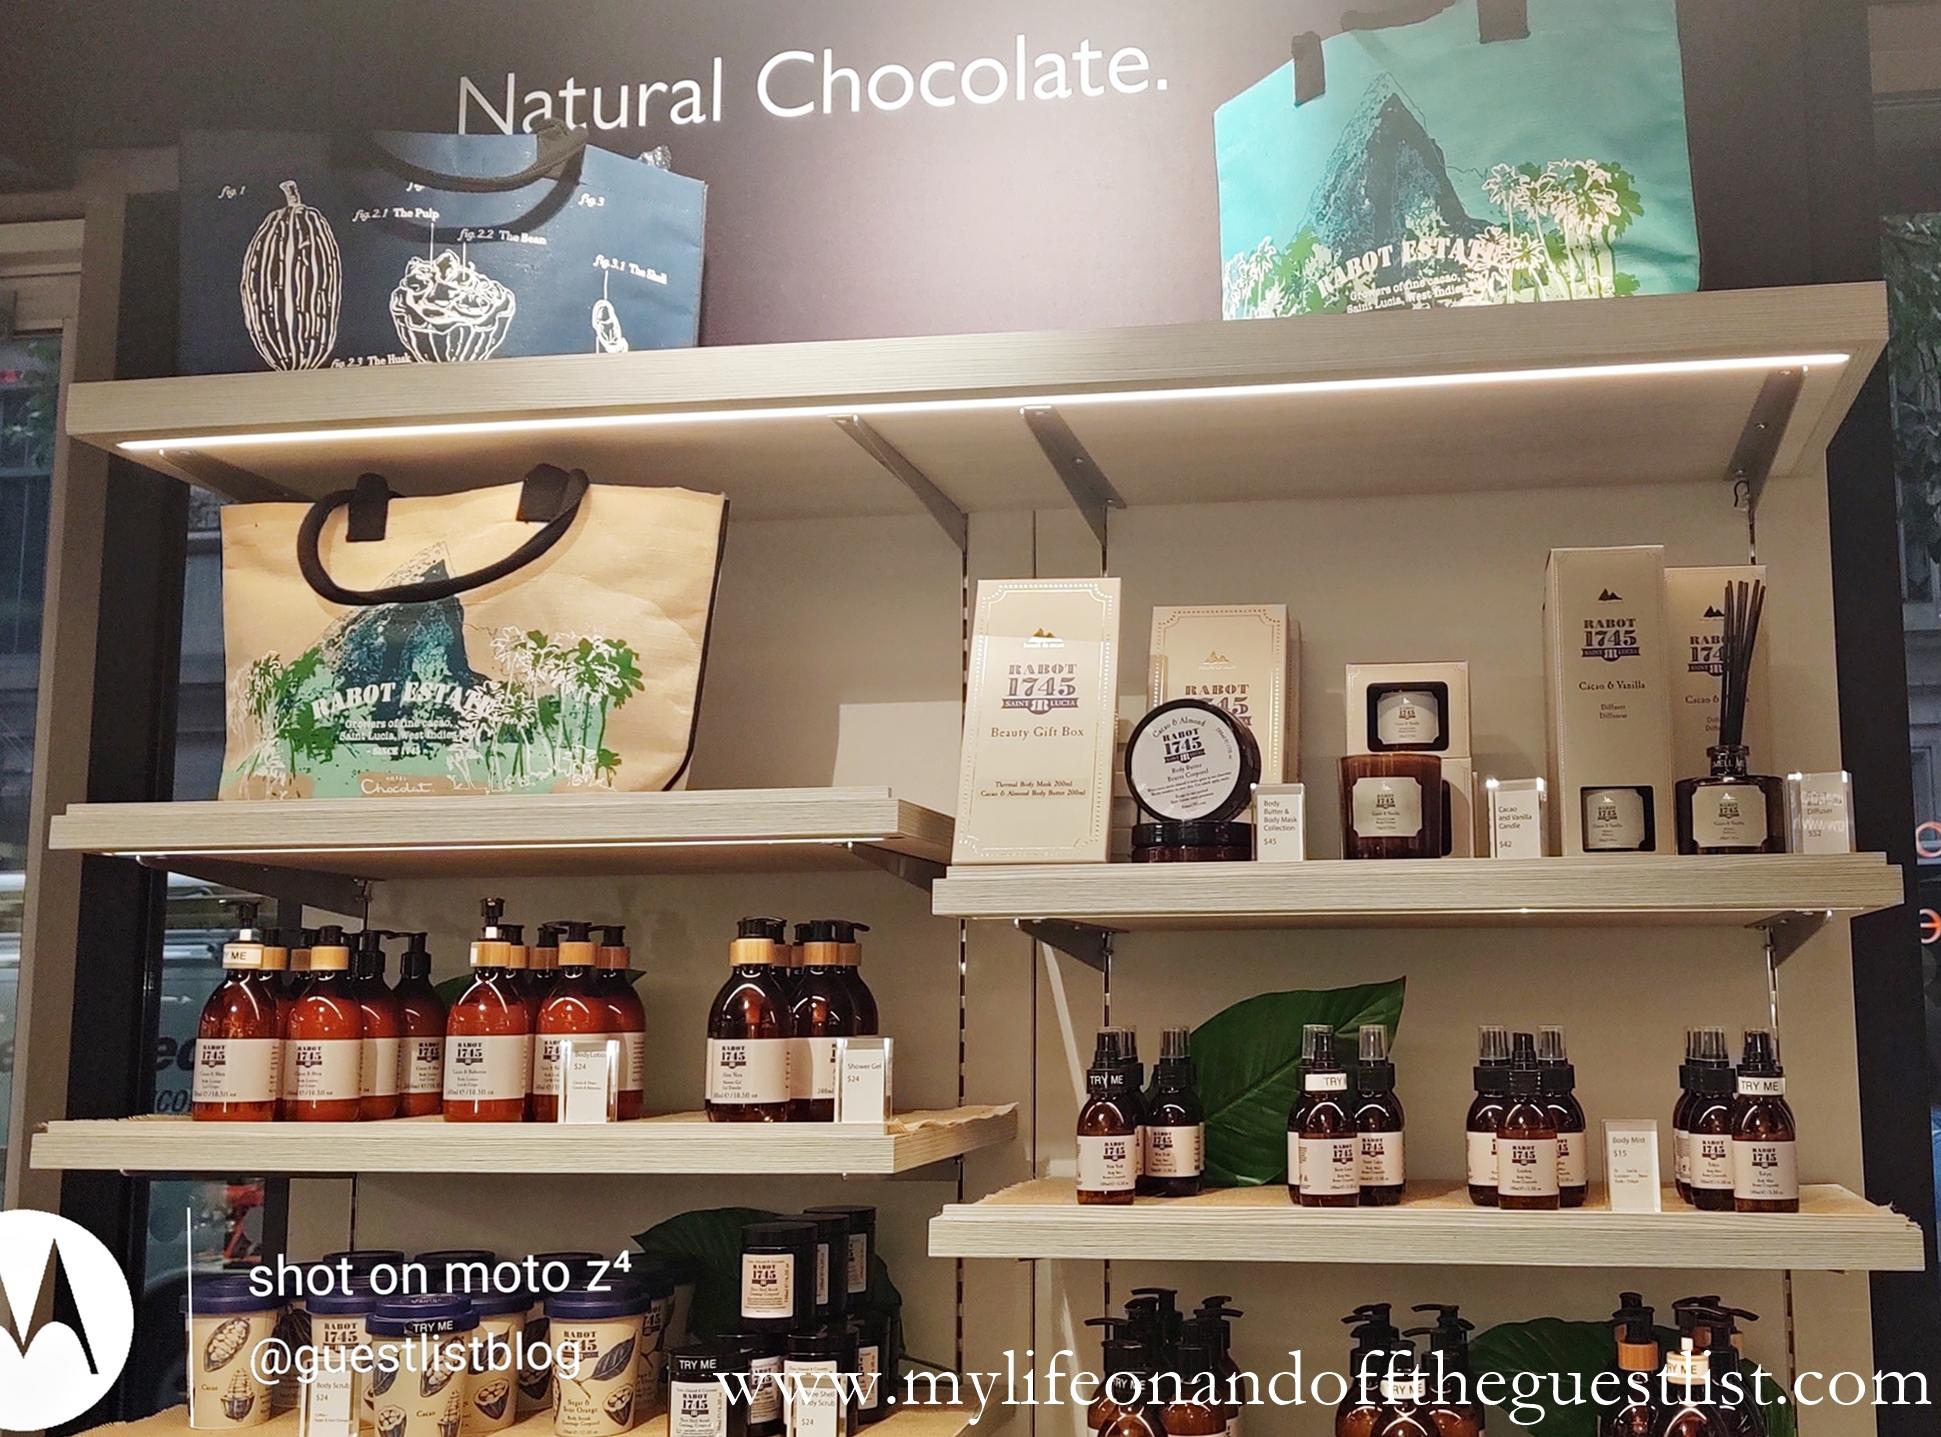 Hotel Chocolat's Rabot 1745 Beauty Makes its US Debut